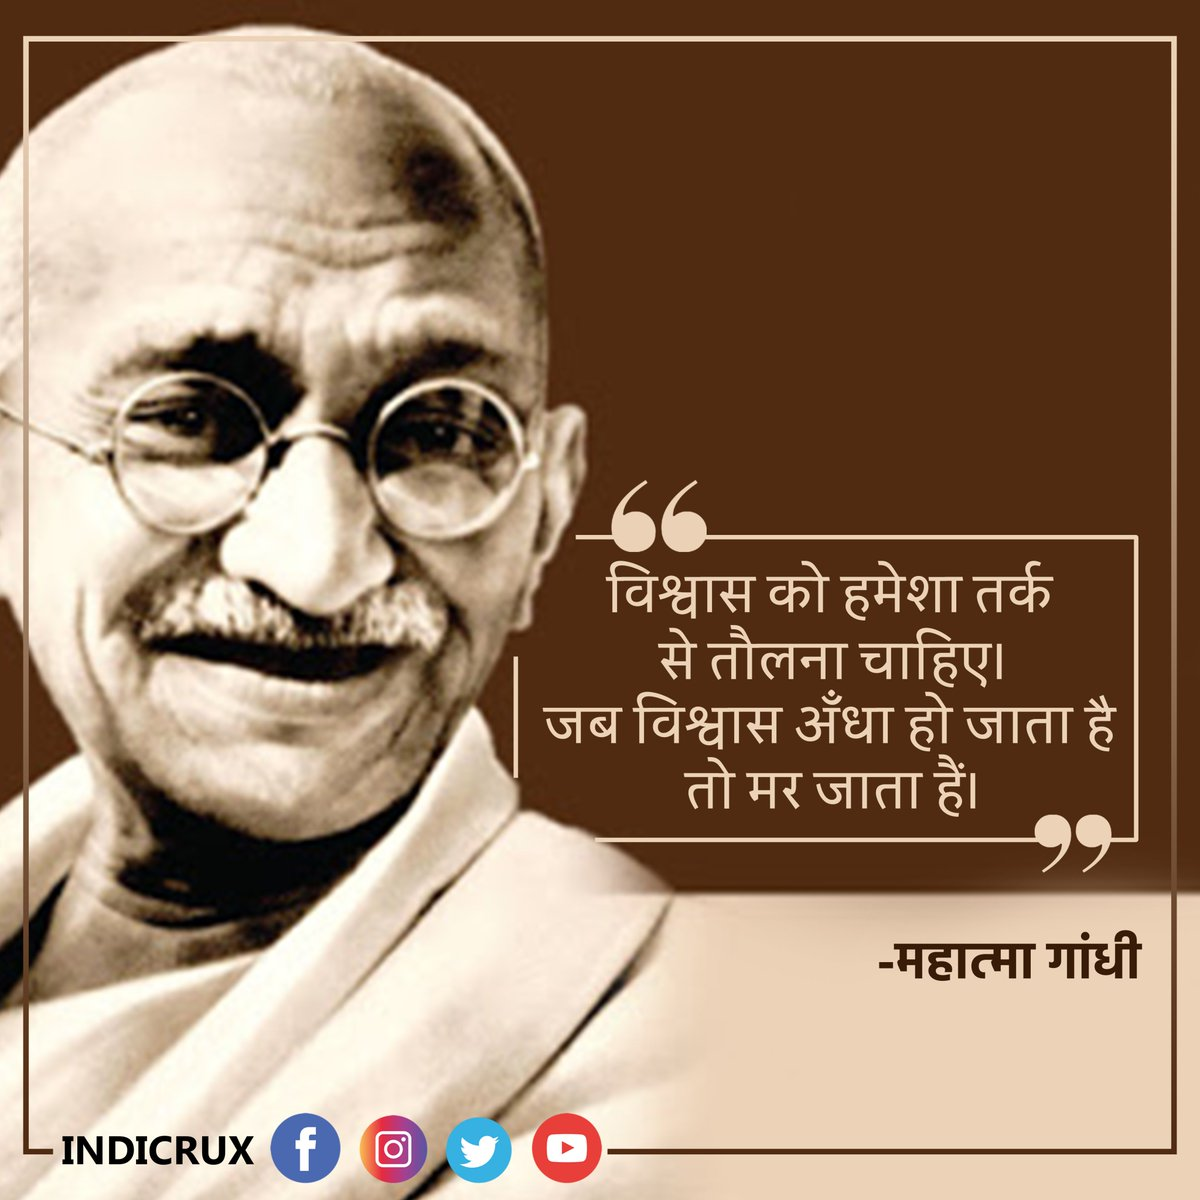 विश्वास को हमेशा तर्क से तौलना चाहिए। जब विश्वास अँधा हो जाता है तो मर जाता हैं। ... #gandhiji #gandhi #mahatmagandhi #india #gandhijayanti #gandhiquotes #freedom #indian #mahatma #fatherofthenation #peace #art #quotes #gandhijayanthi #bapu #fatherofnation #october #nonviolence